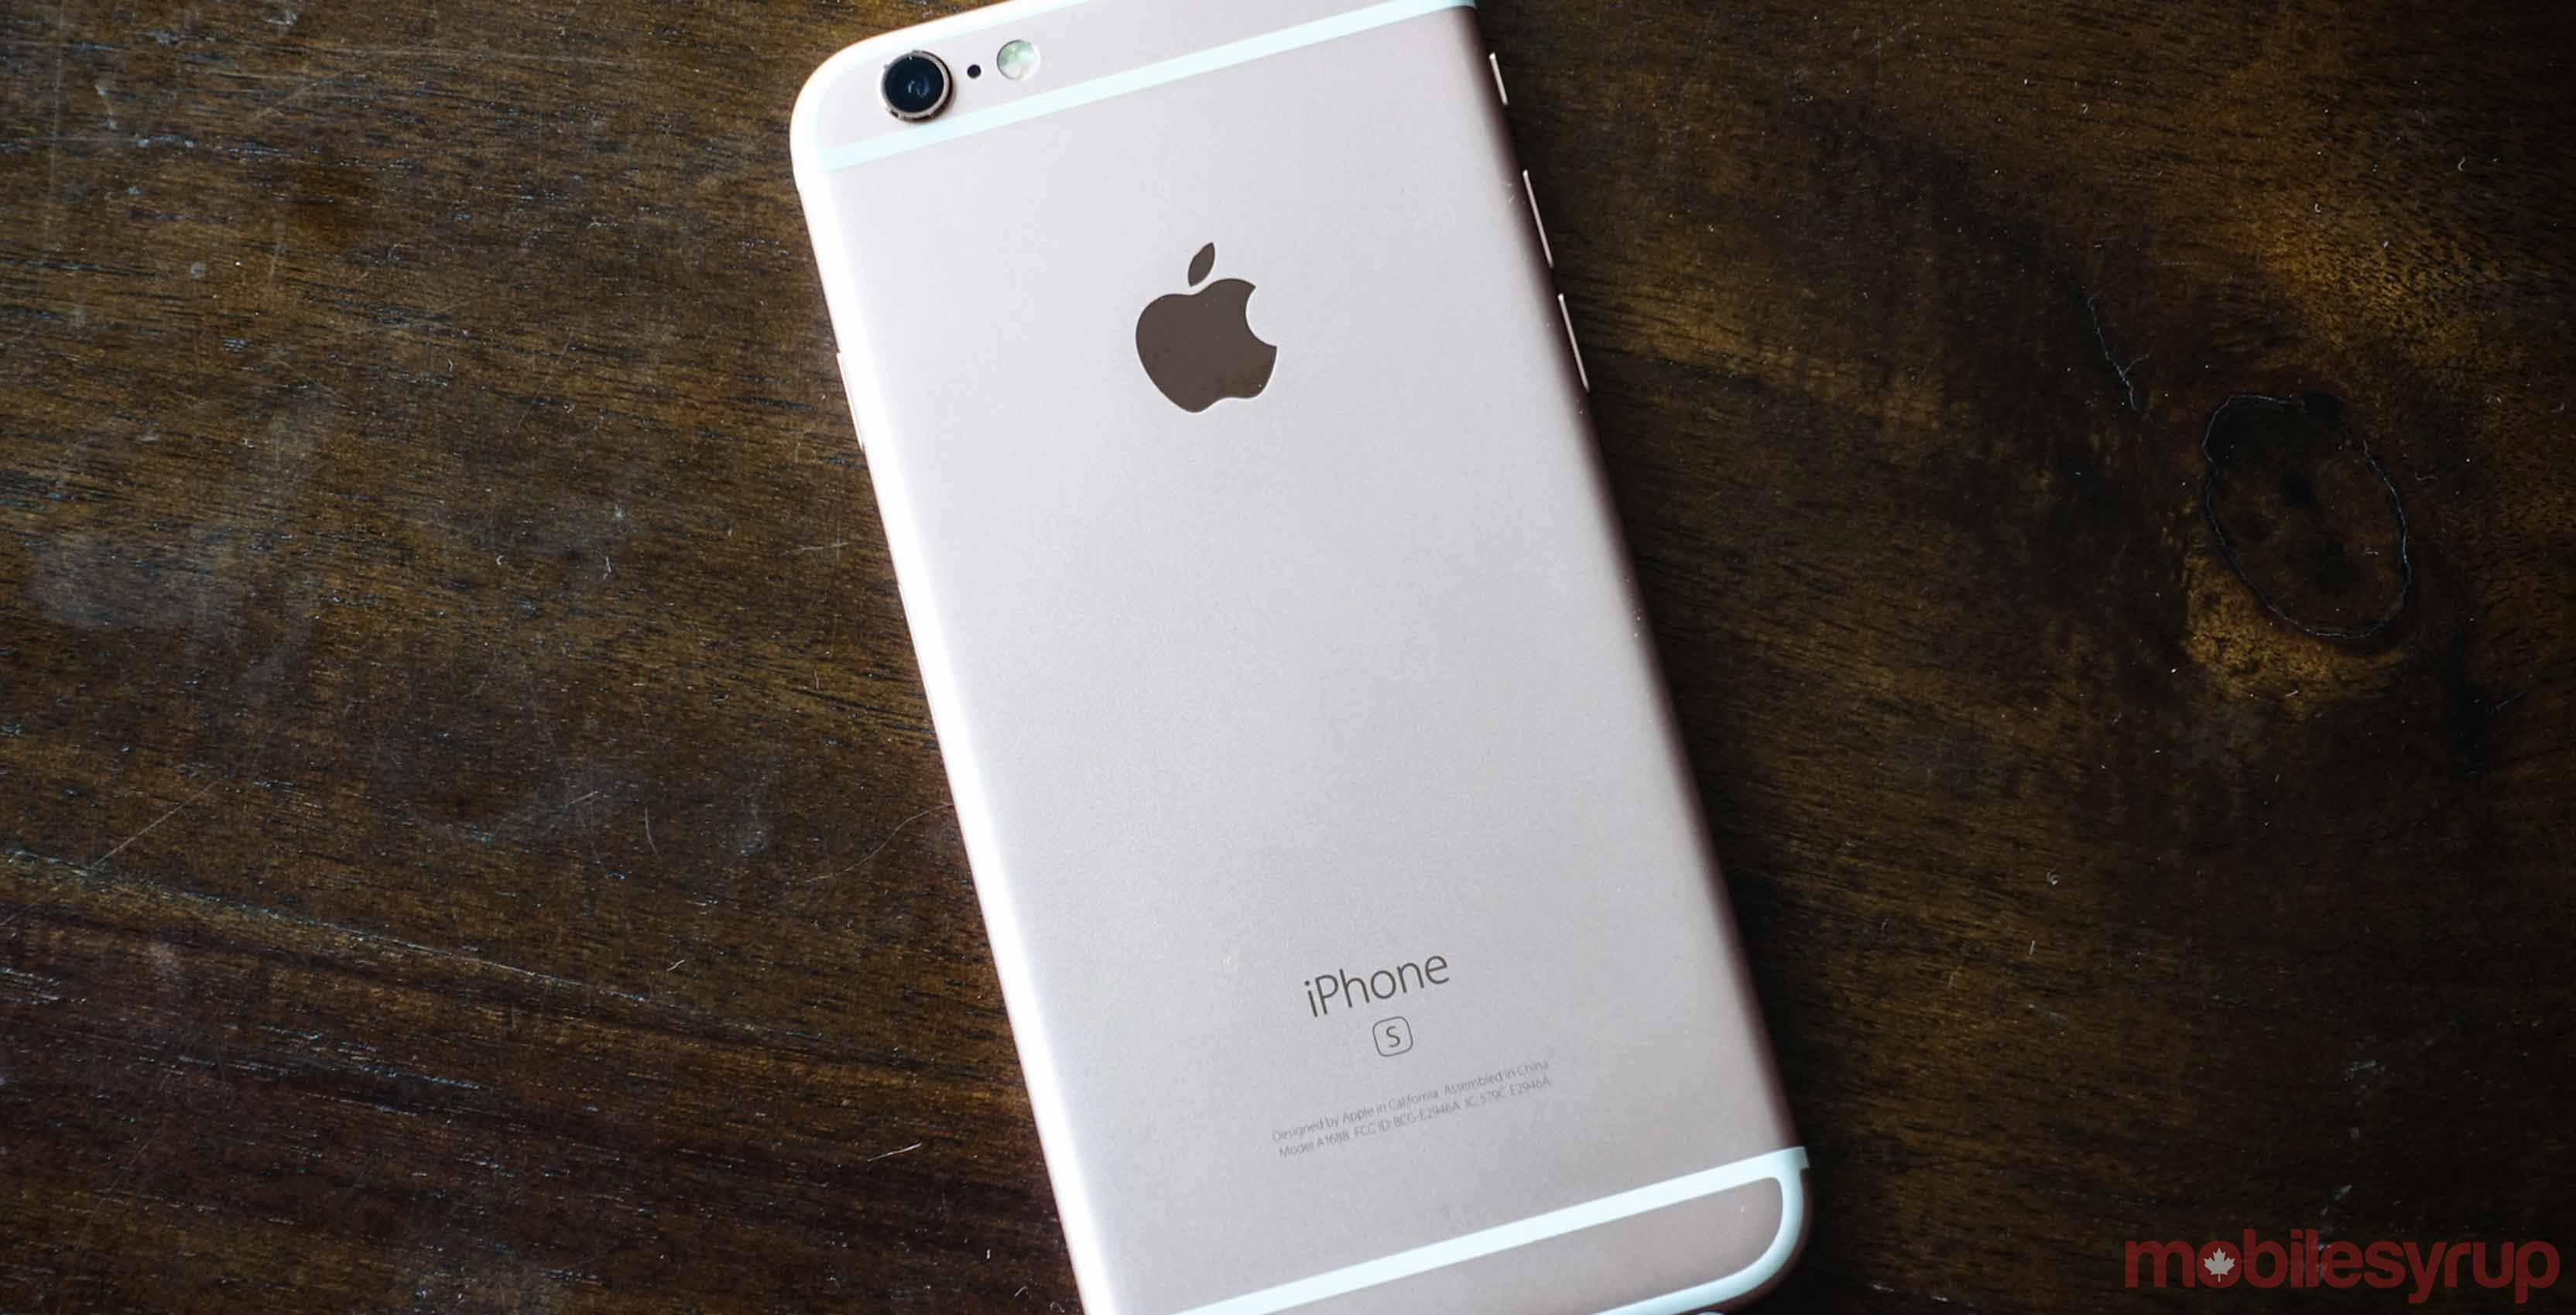 iPhone 6 back - Apple AR iPhone 8